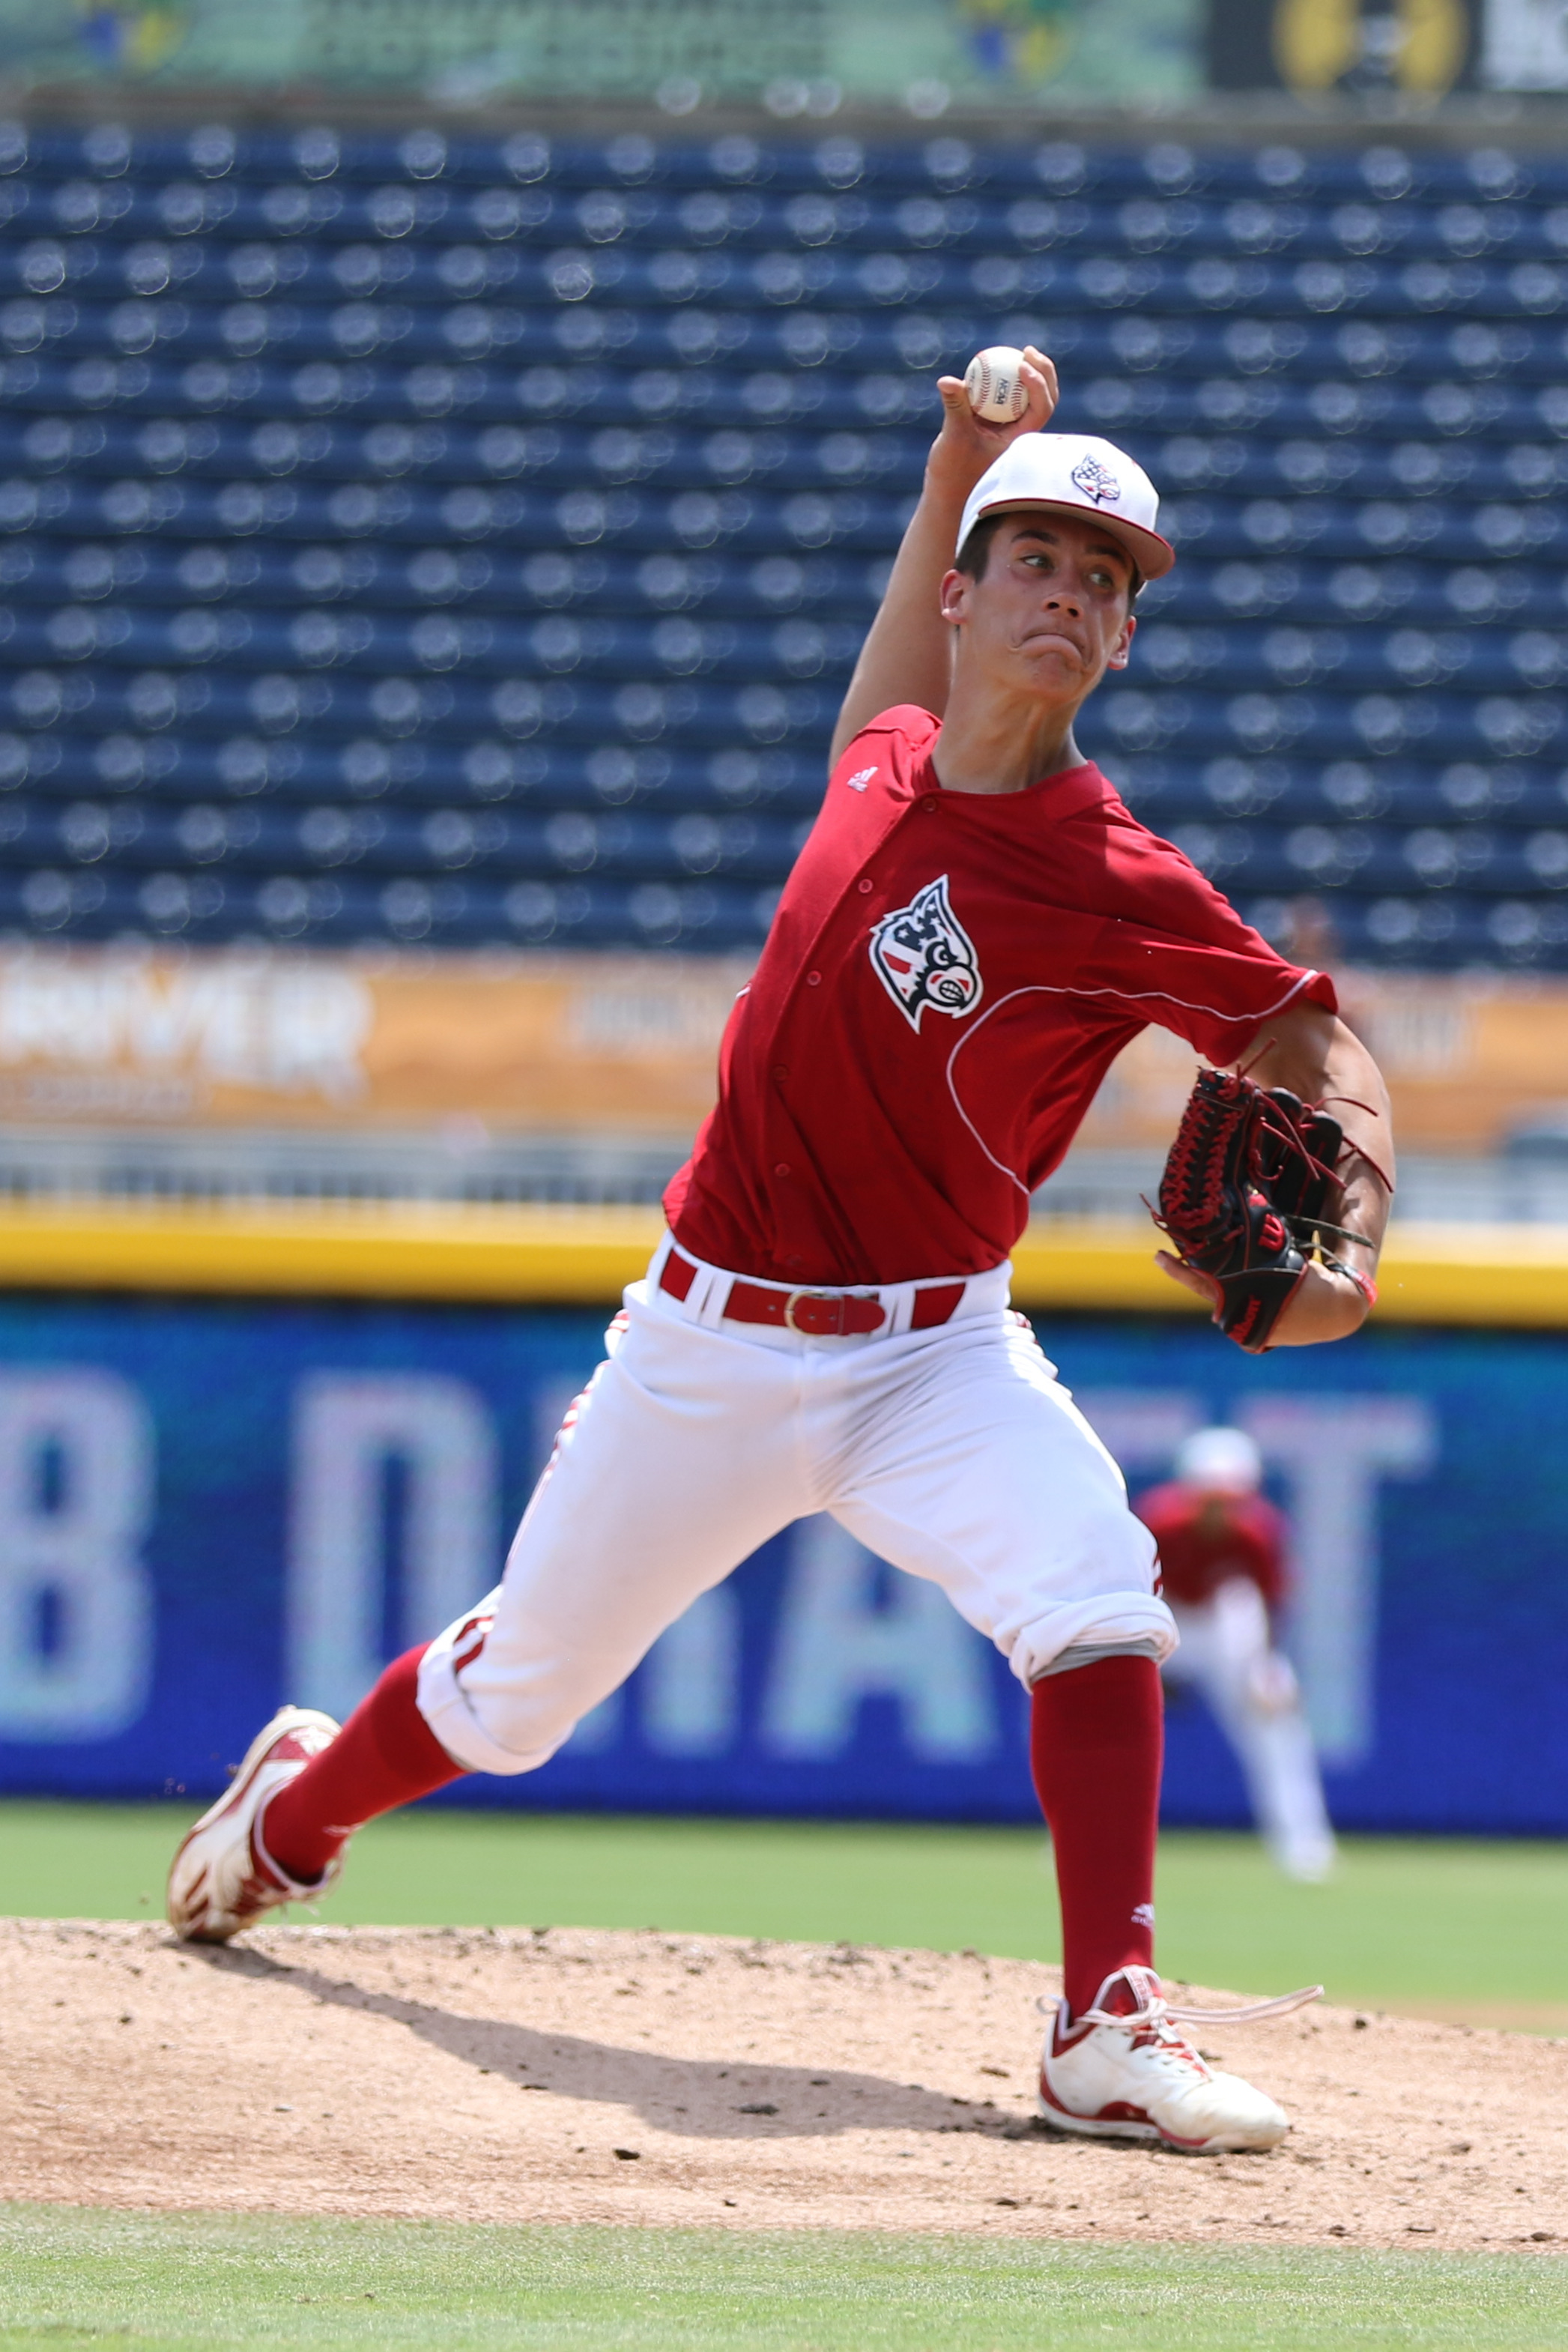 COLLEGE BASEBALL: MAY 27 ACC Baseball Championship